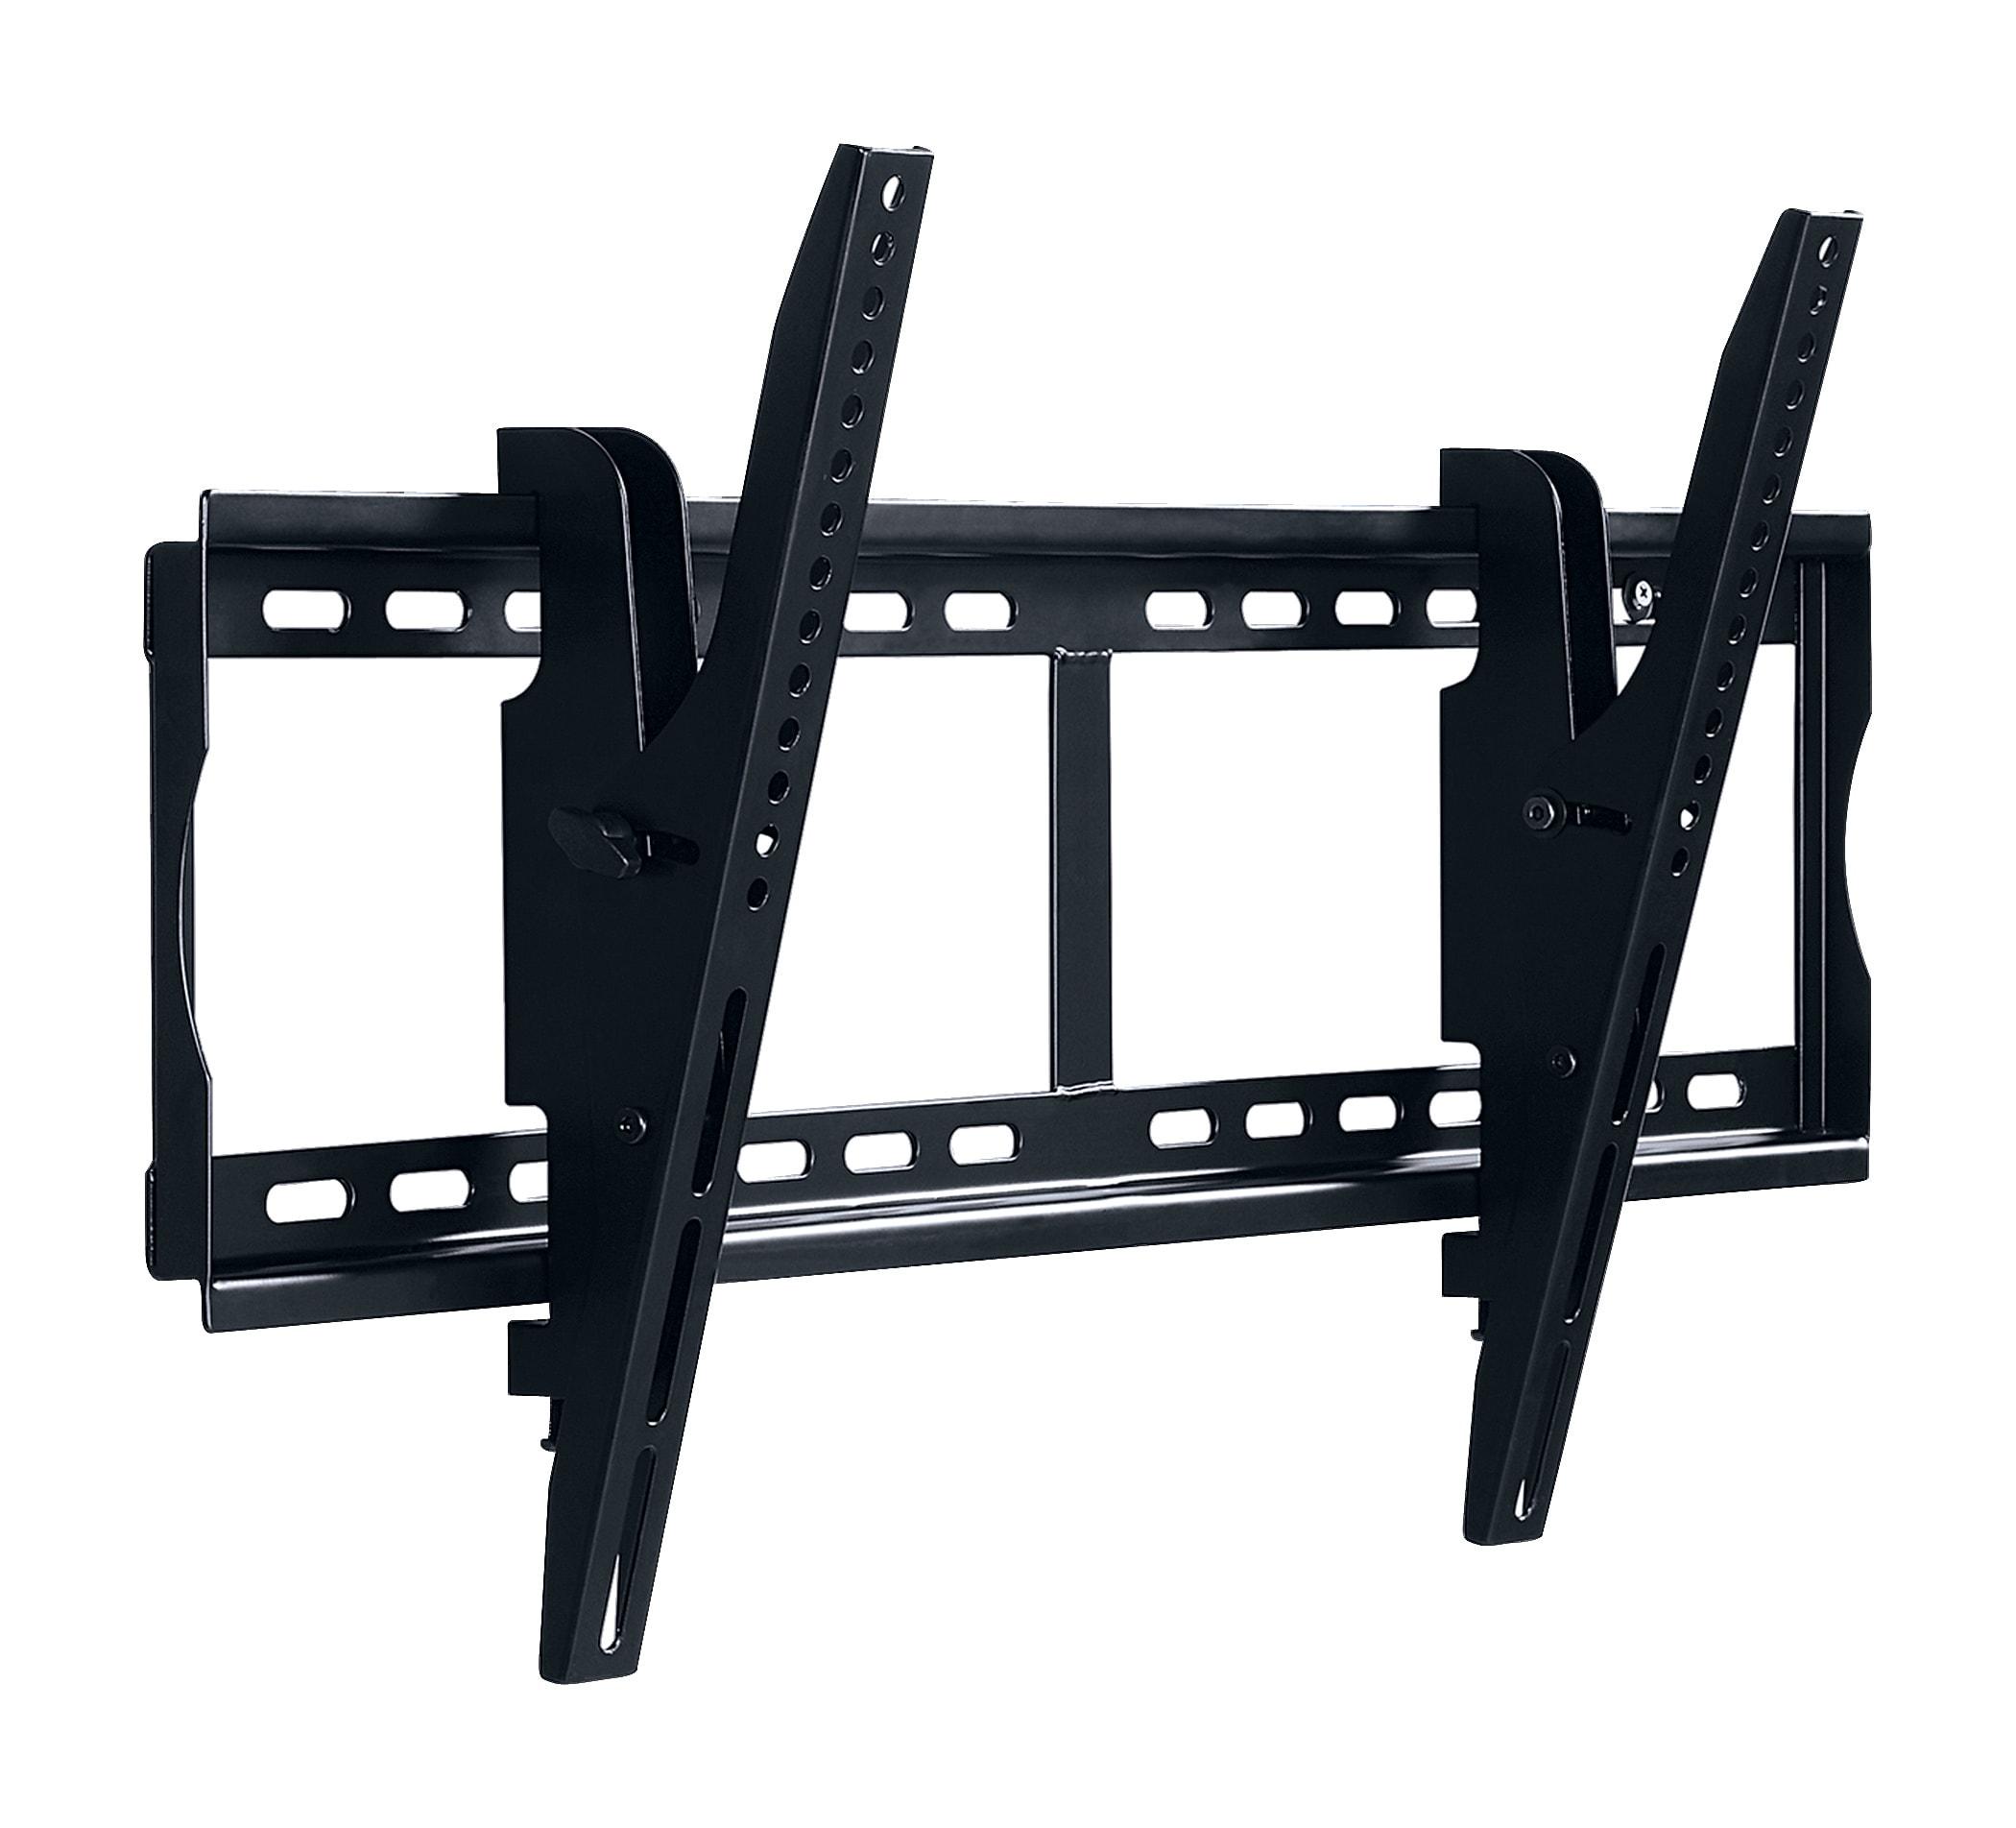 "Atlantic Large Tilting Wall Mount For 37 - 70"" Flat Screen TVs, Black"